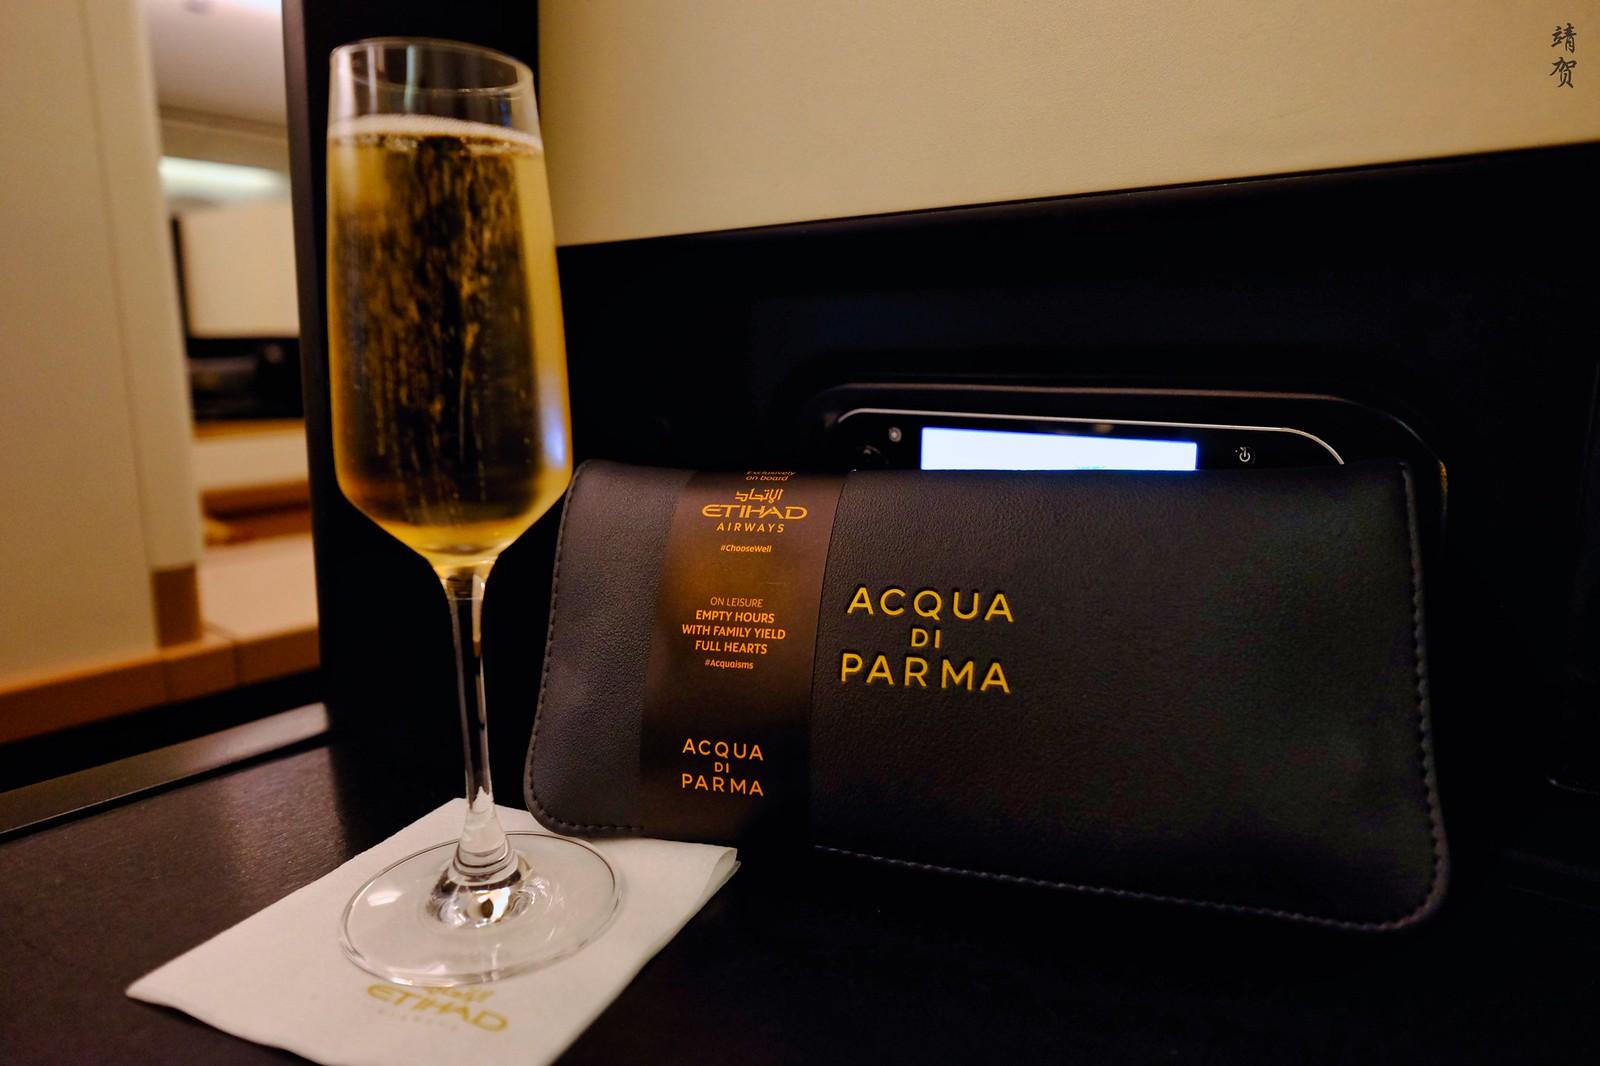 Acqua di Parma amenity kit